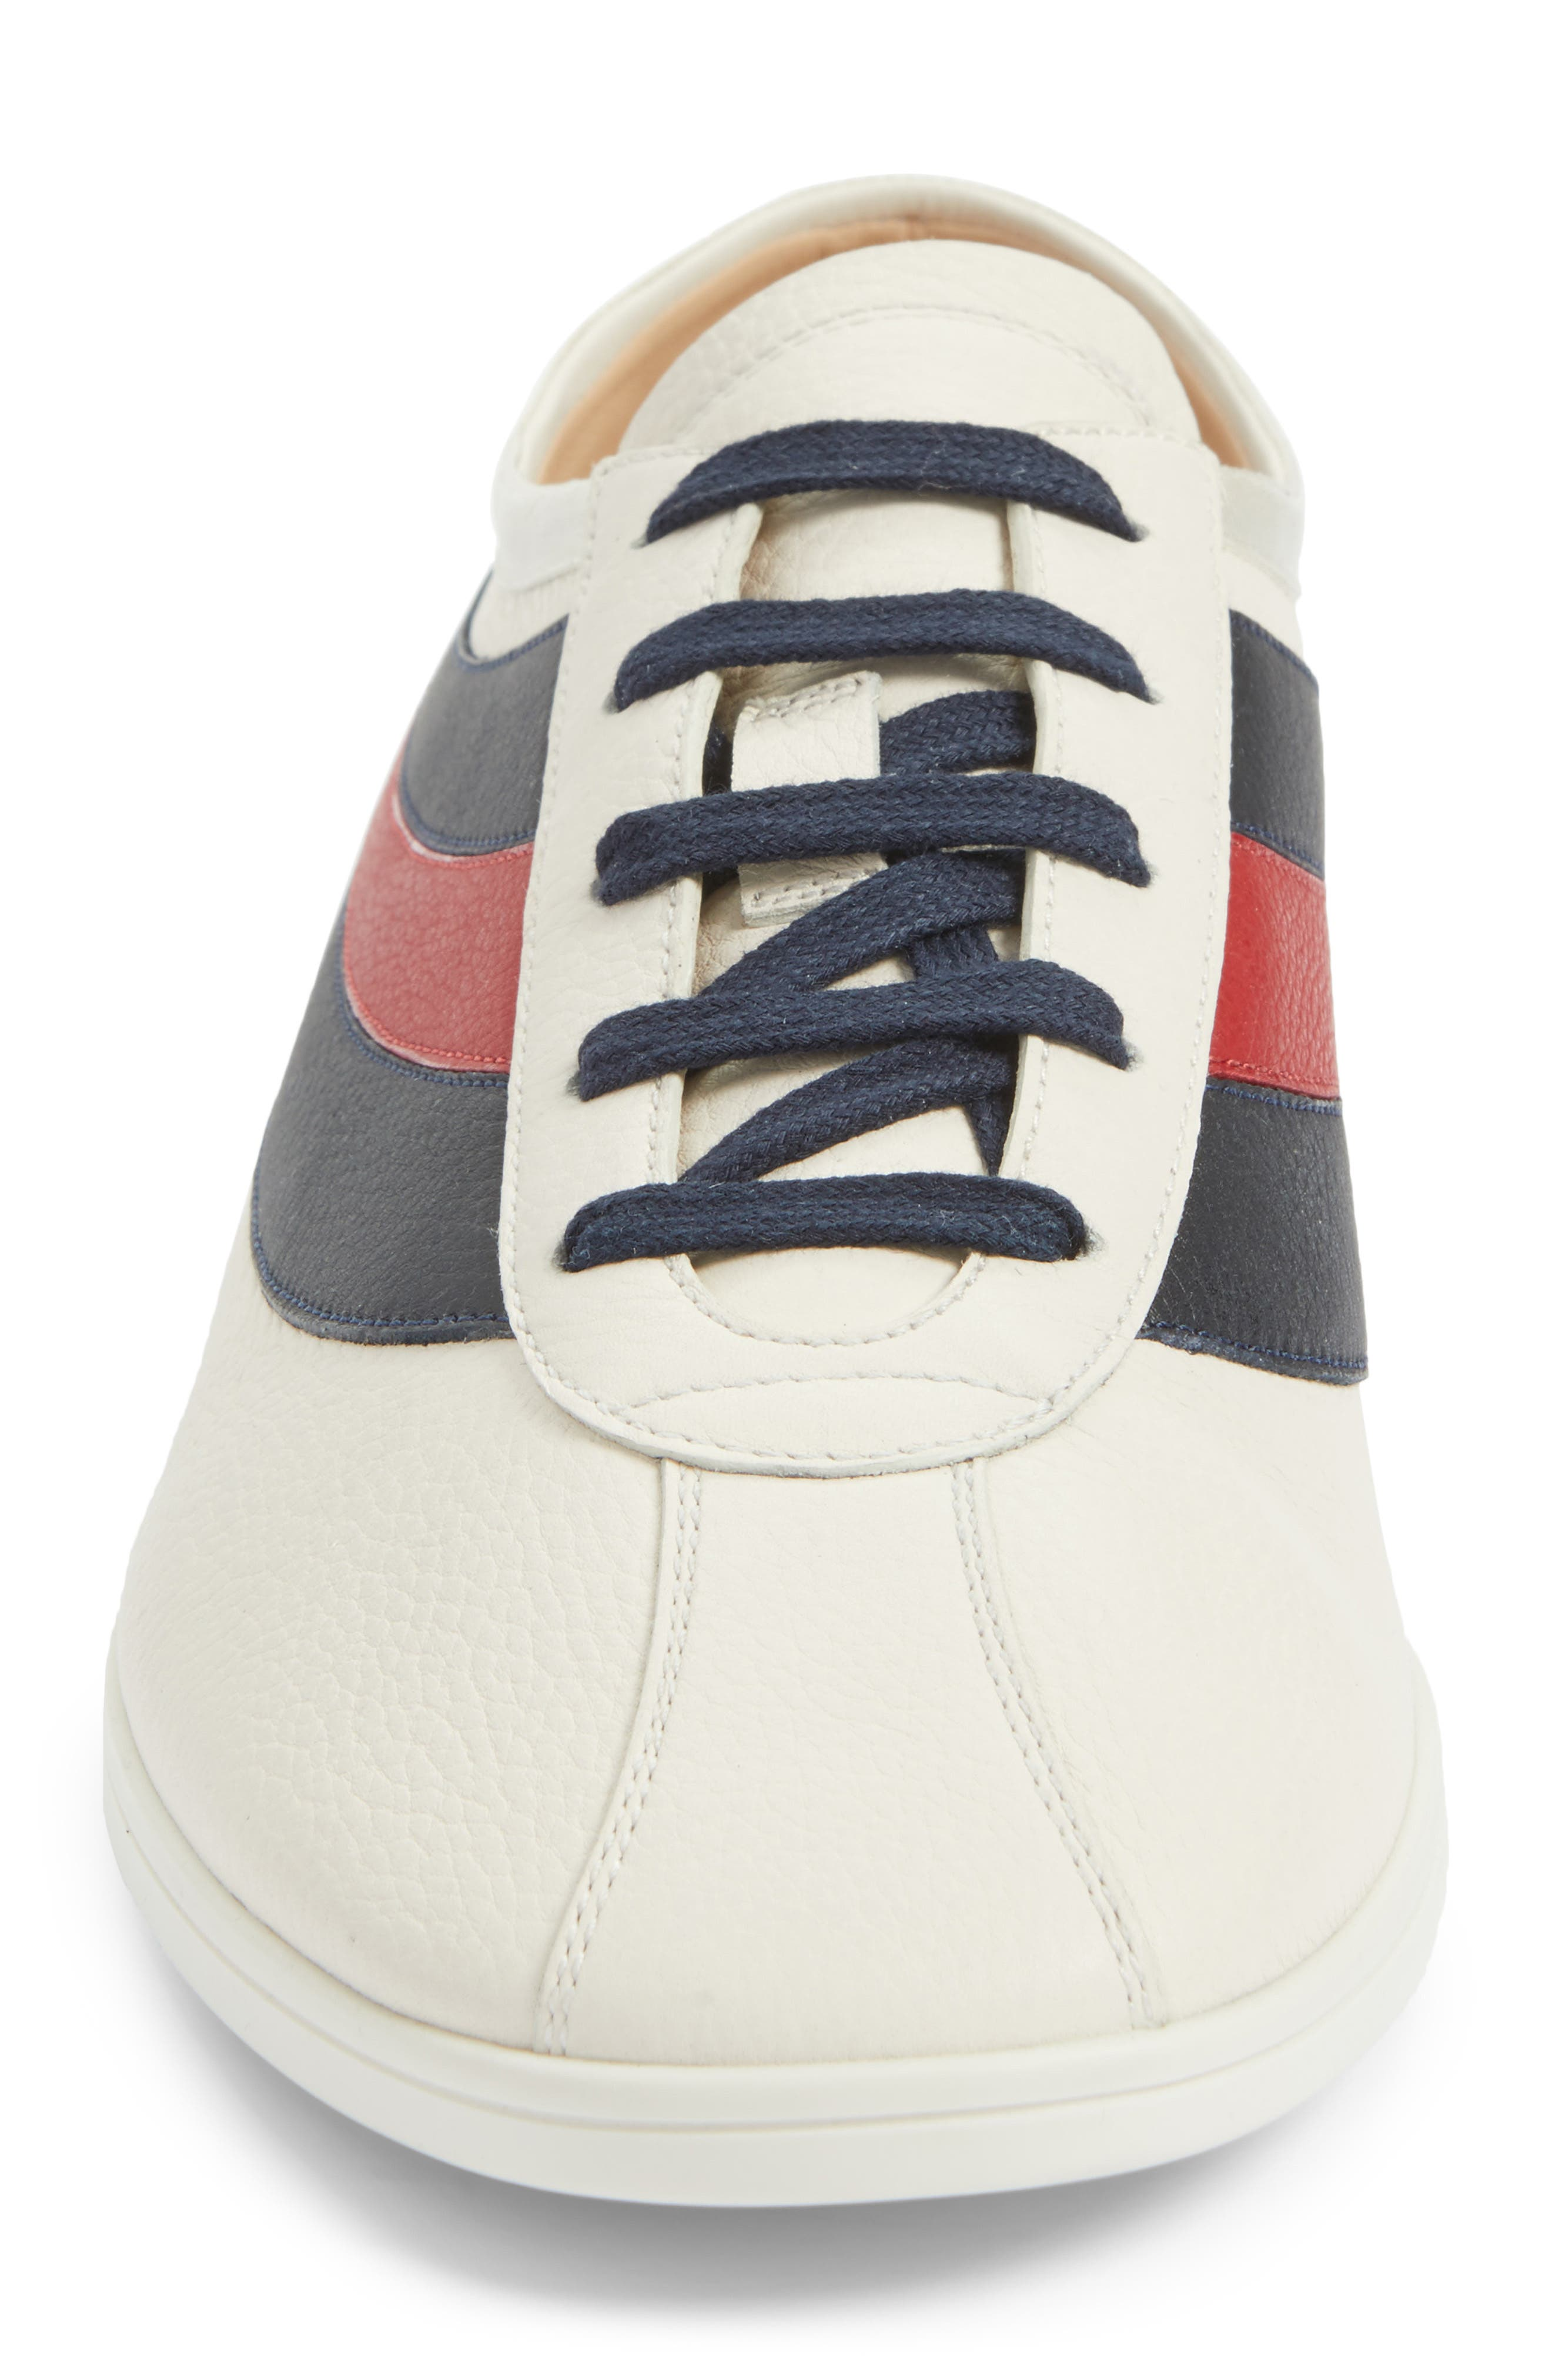 Falacer Sneaker,                             Alternate thumbnail 4, color,                             White